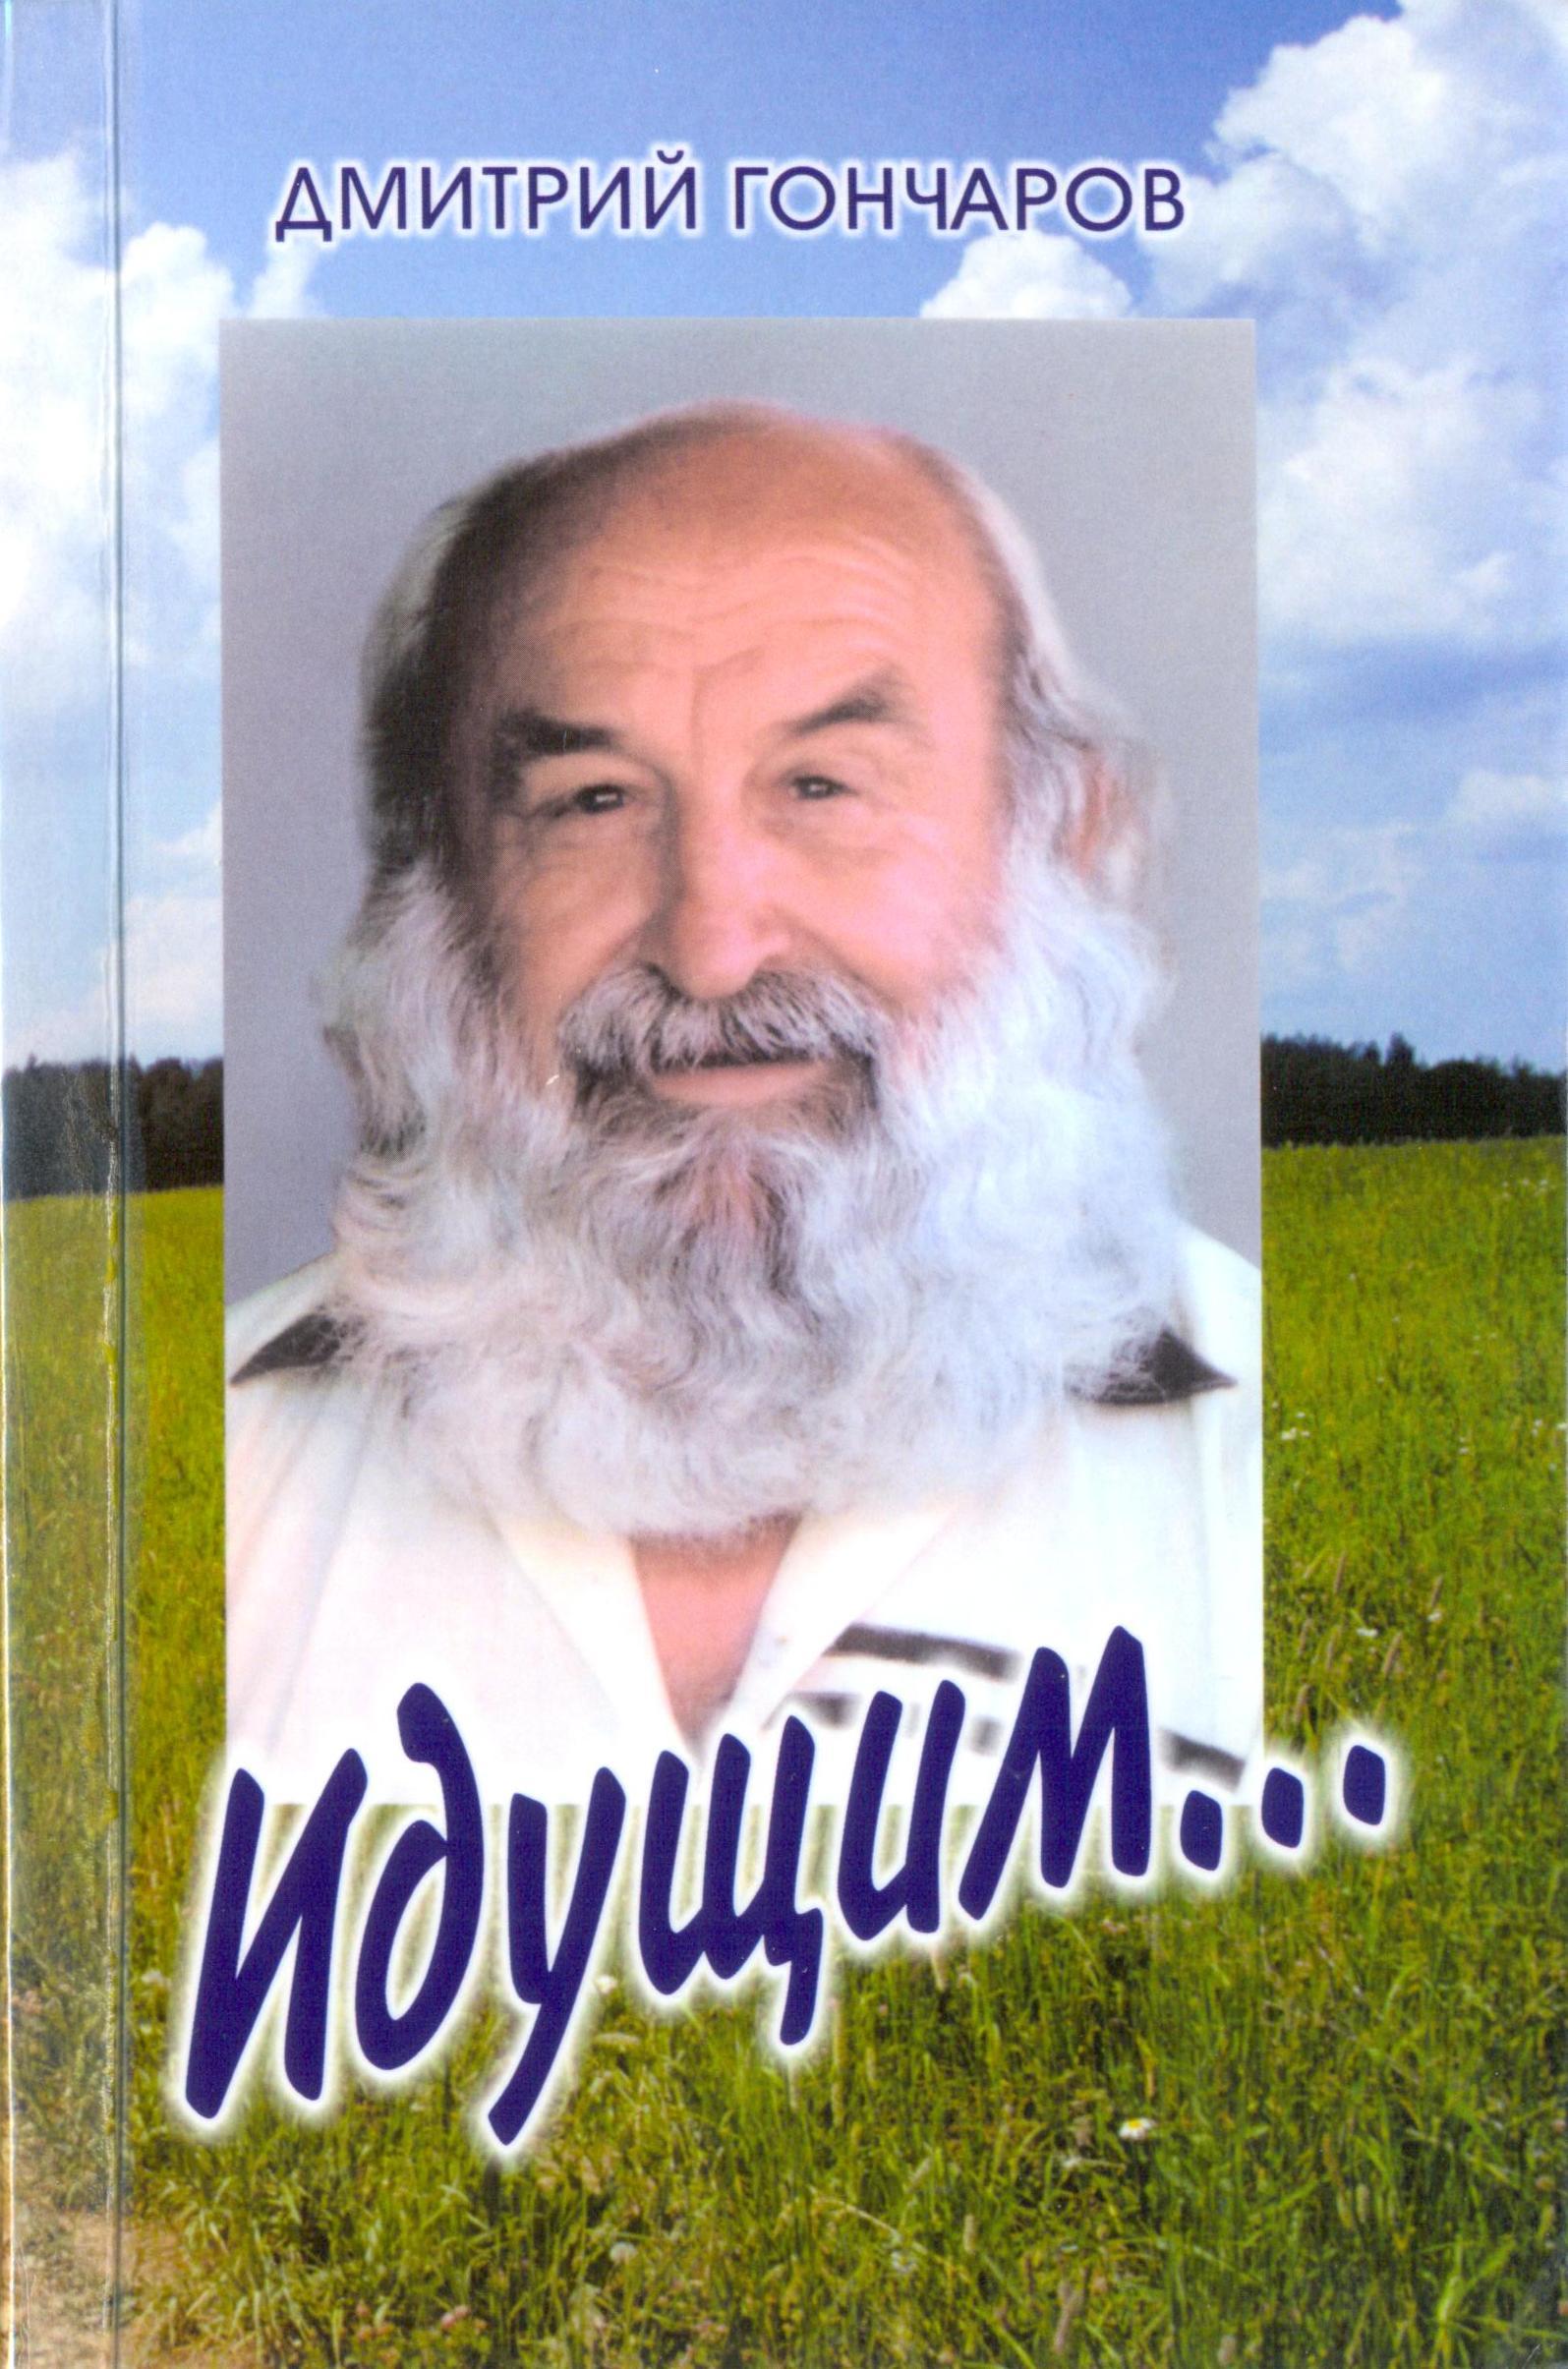 1 Дмитрий Гончаров  Идущим...  титул книги.jpg